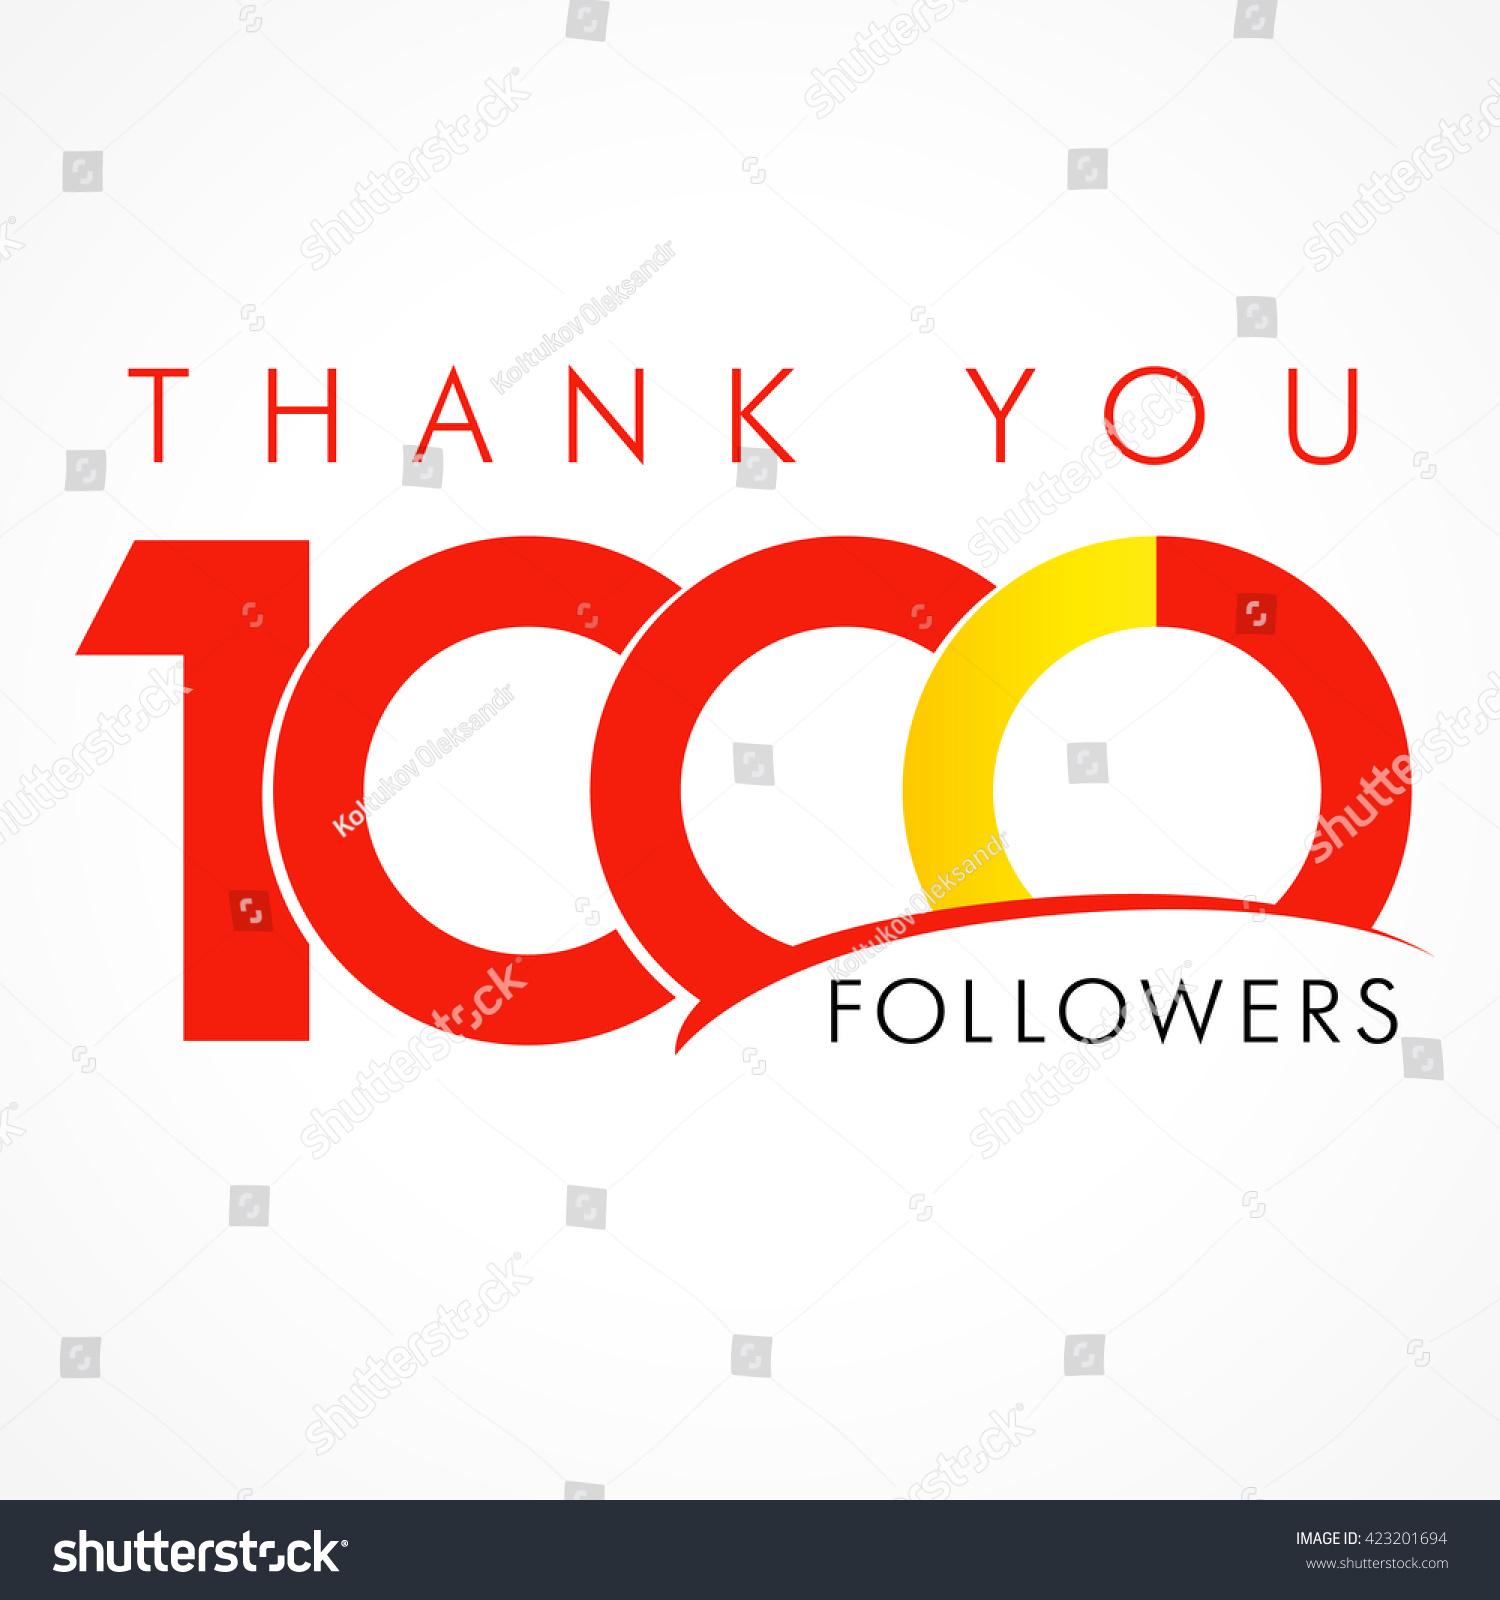 thanks 1000 logotype congratulating coloured networking のベクター